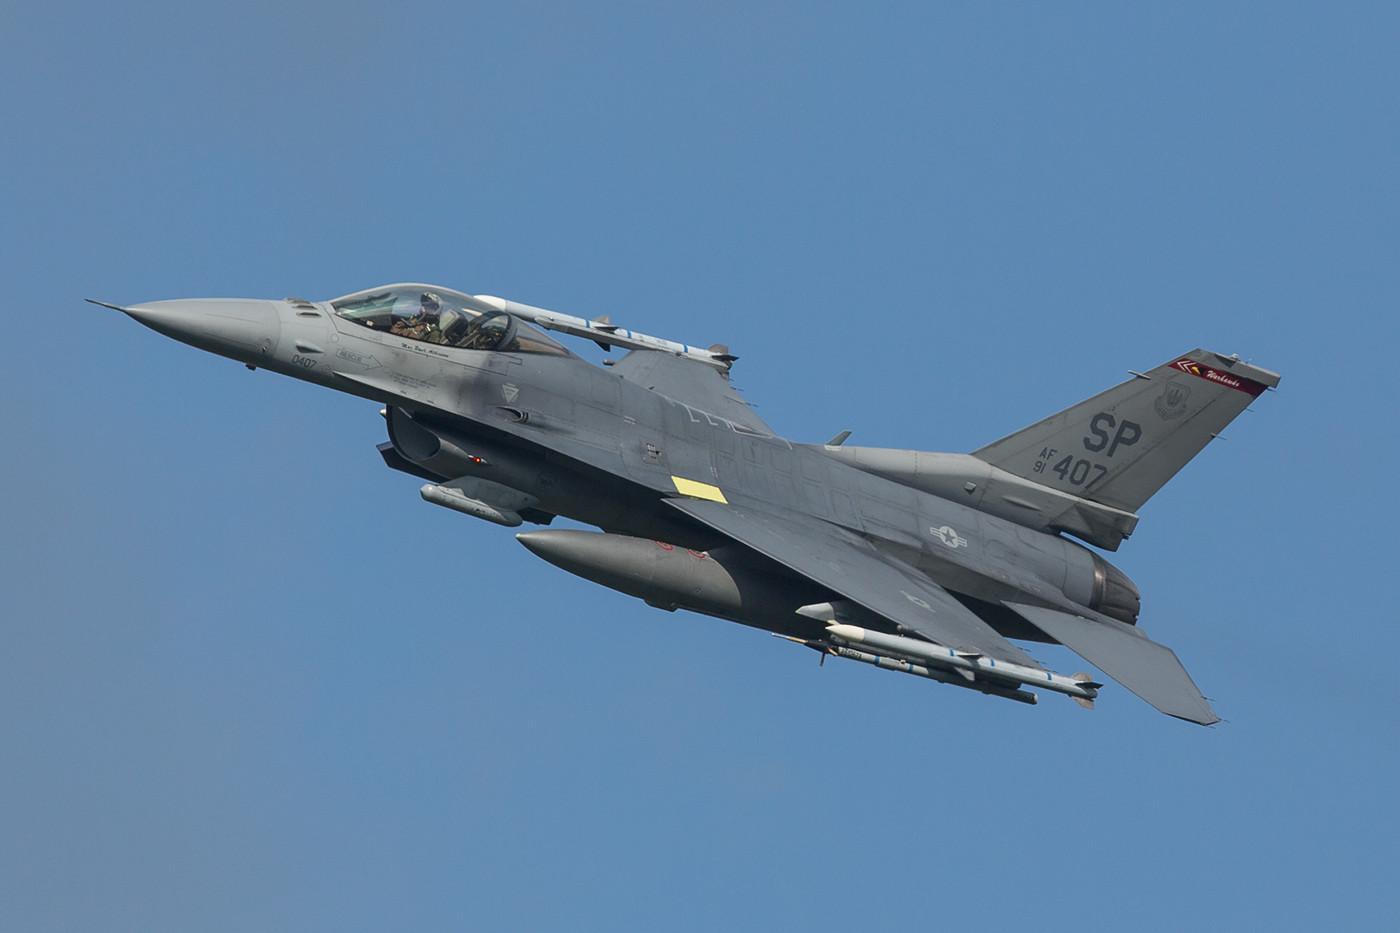 SPM 03.09.2015; 91-0407, F-16C, 52nd FW Spangdahlem (Deutschland)